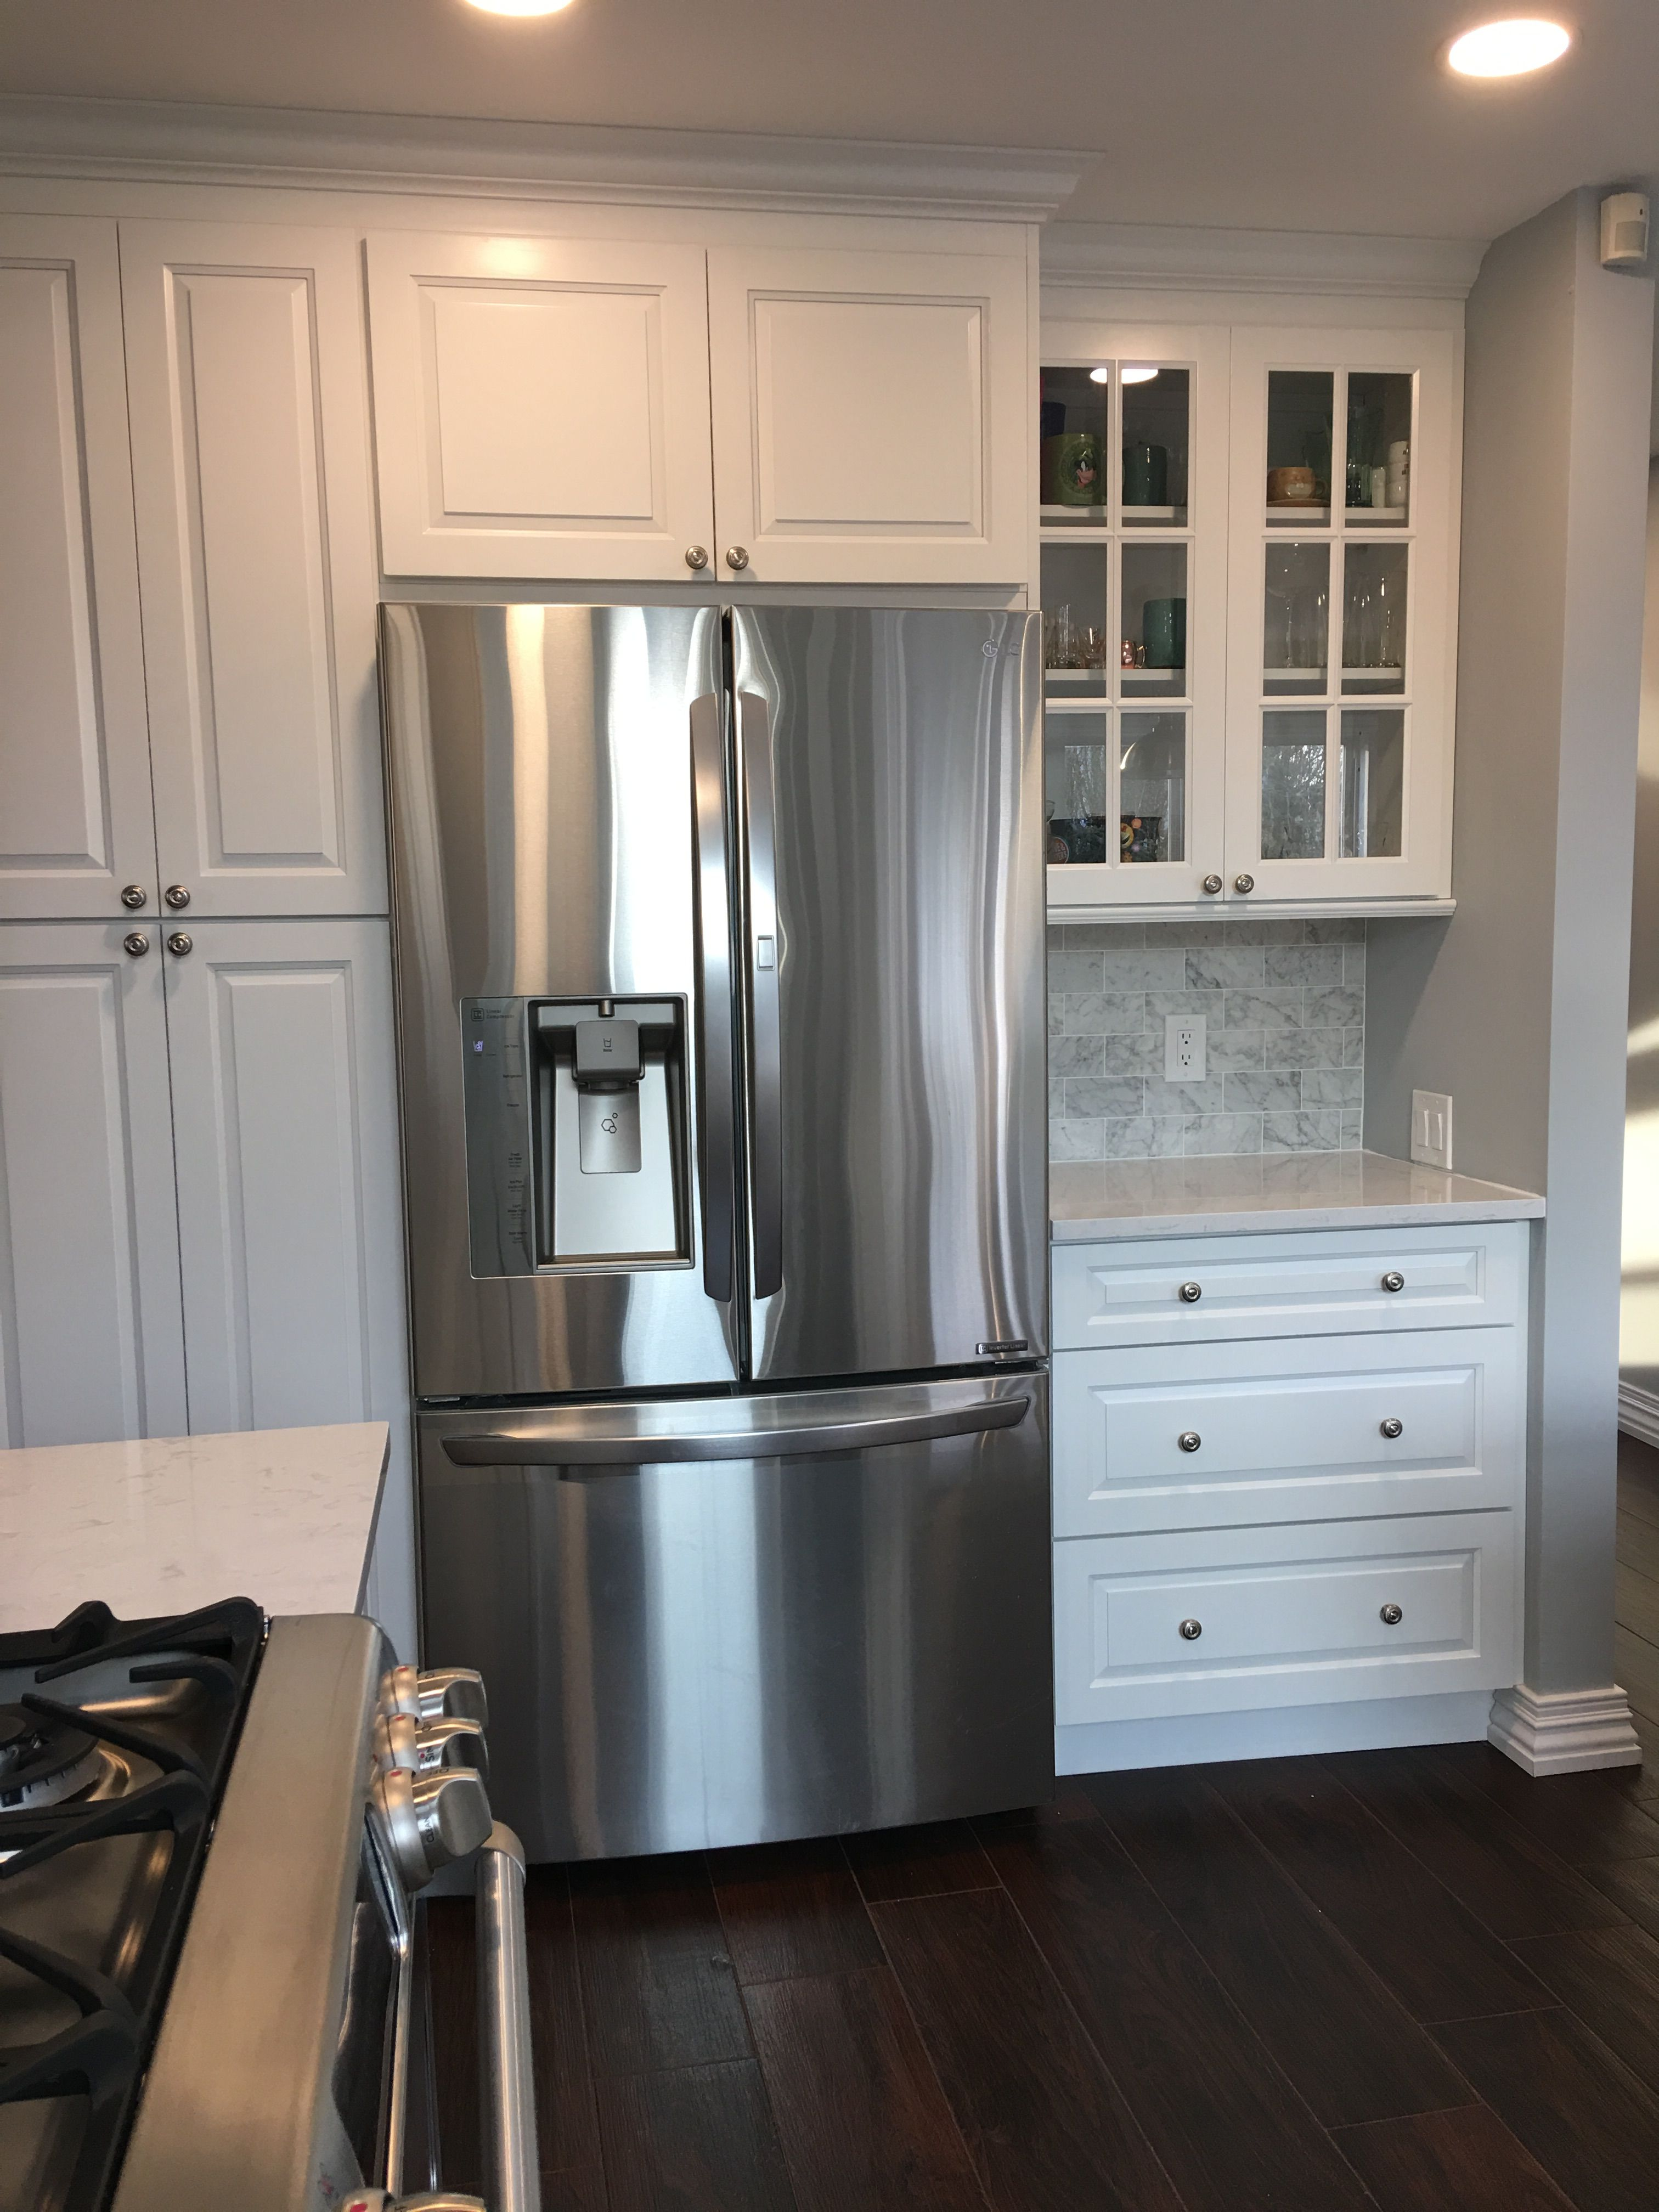 cambria swanbridge quartz white kitchen image by jenny kitchen remodel kitchen nook kitchen on kitchen remodel appliances id=28992